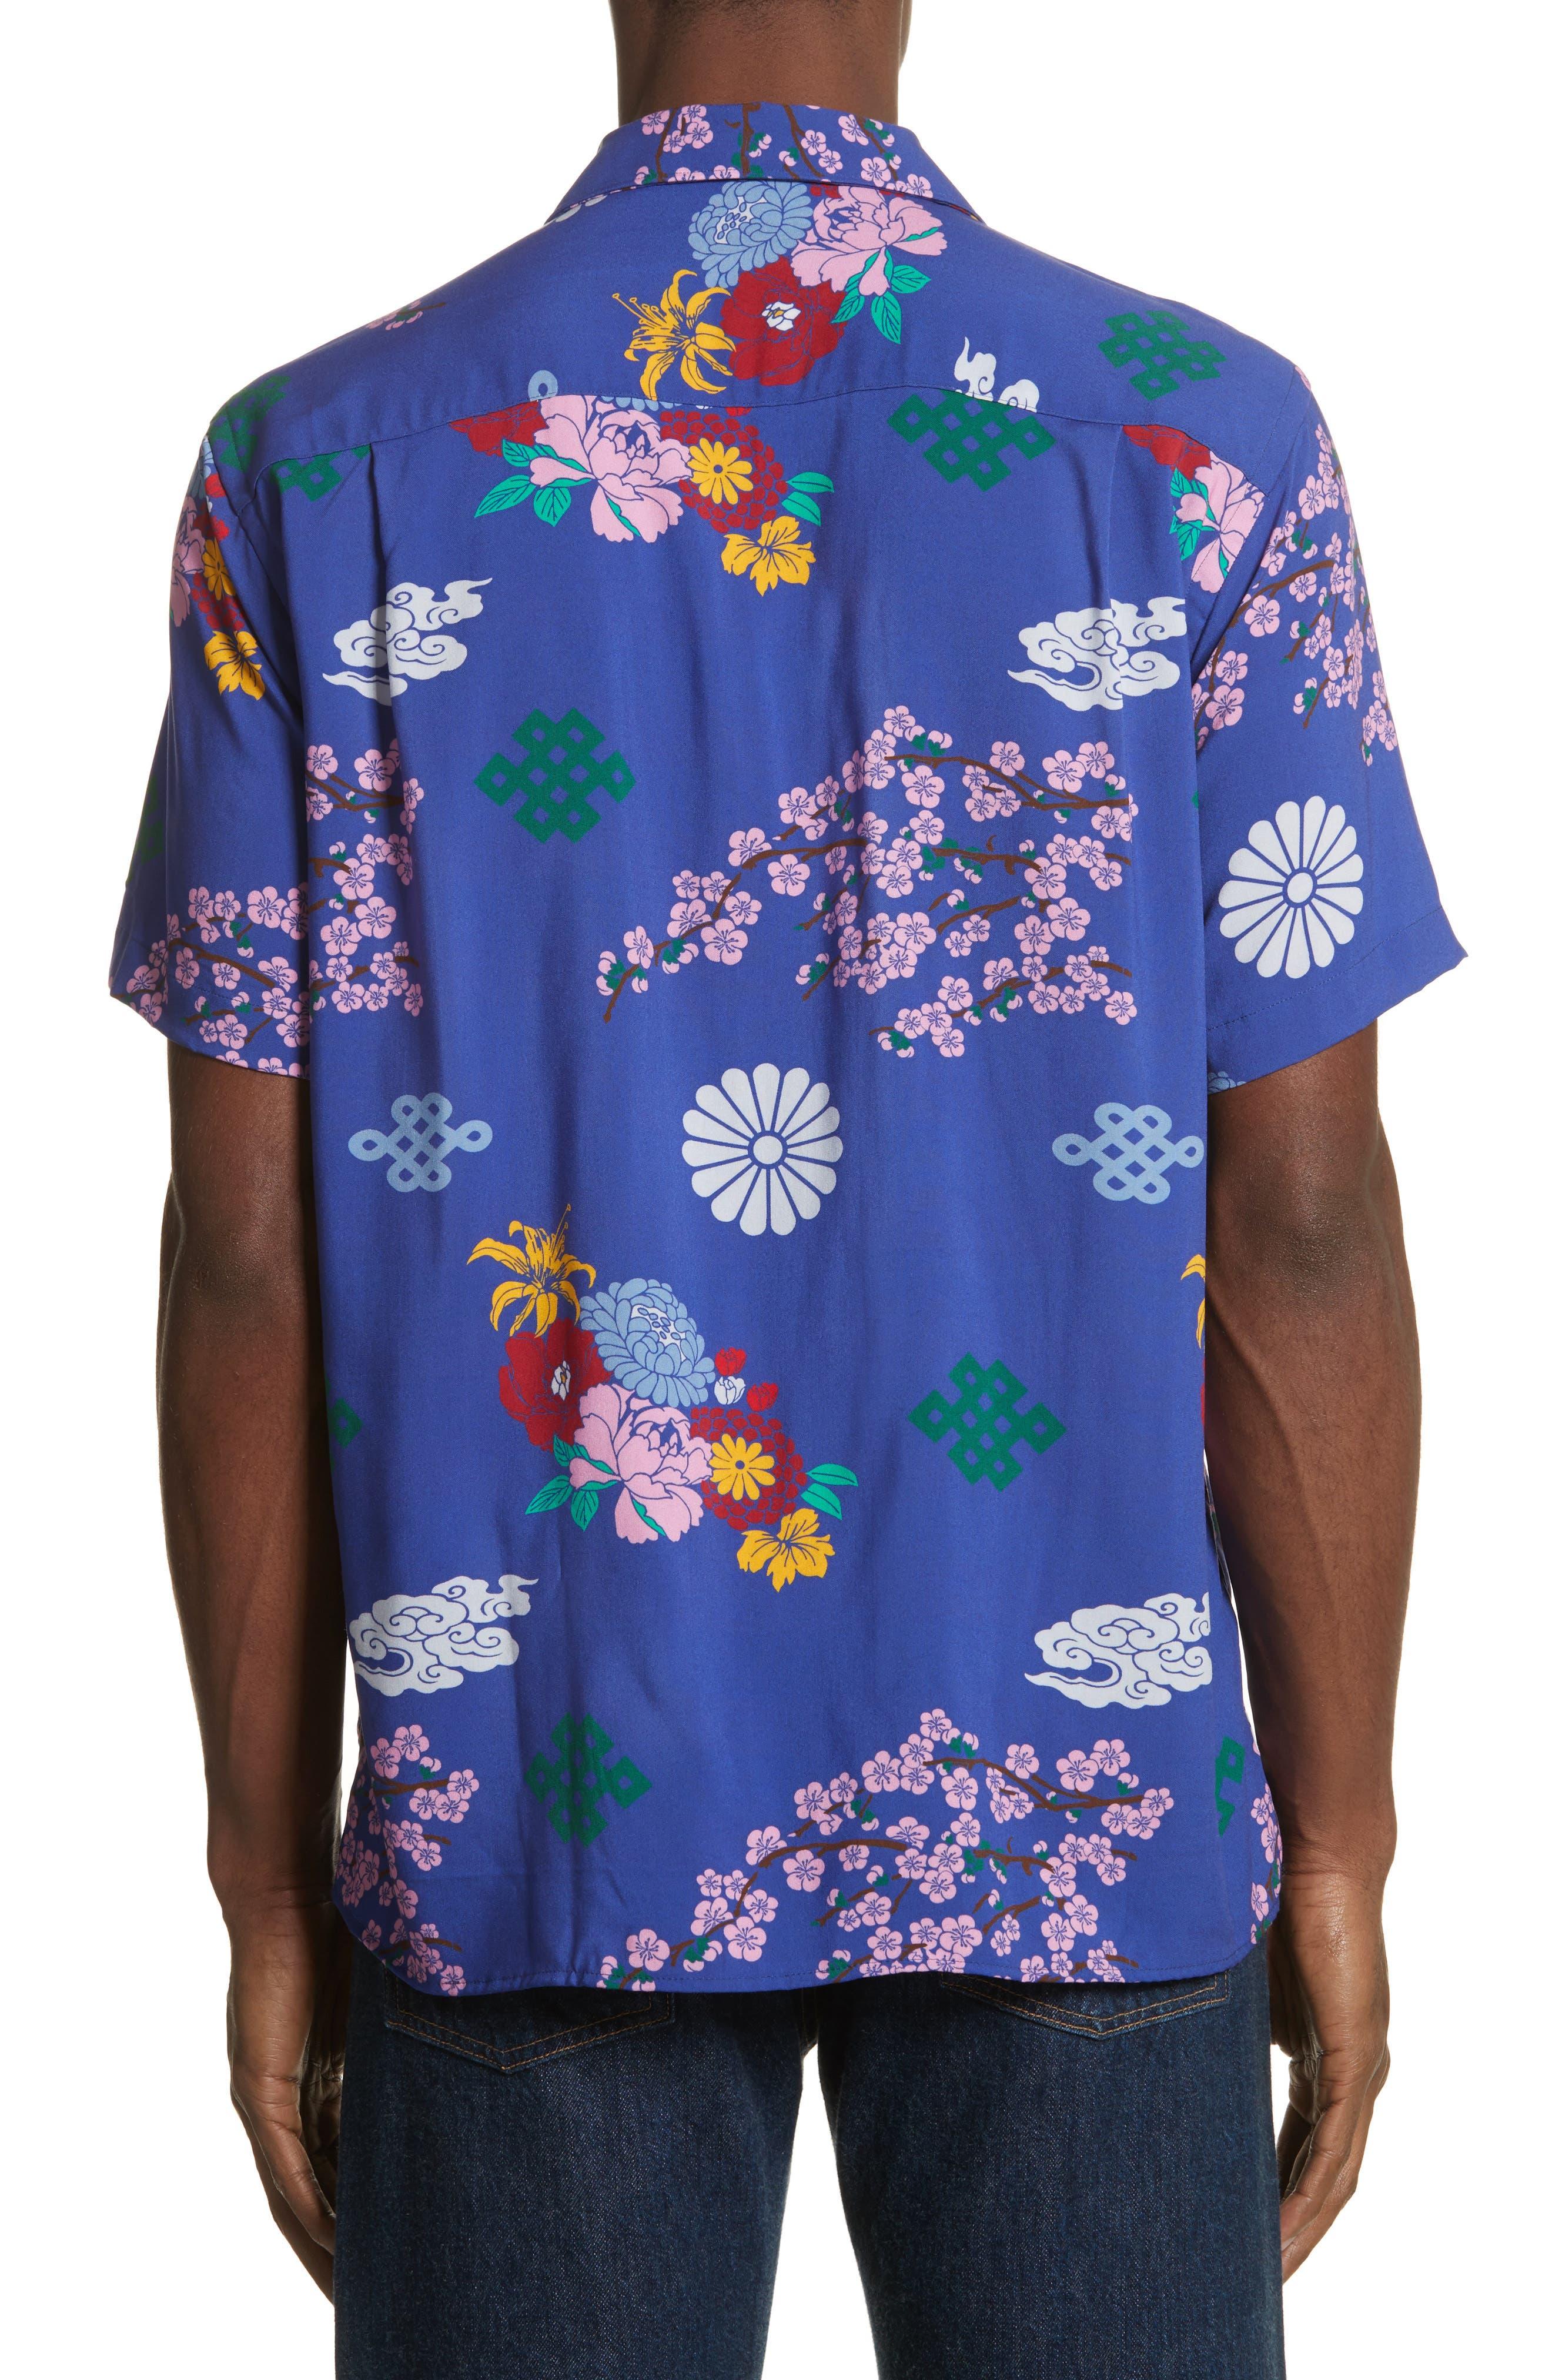 x The North Face Men's Floral Print Camp Shirt,                             Alternate thumbnail 3, color,                             400